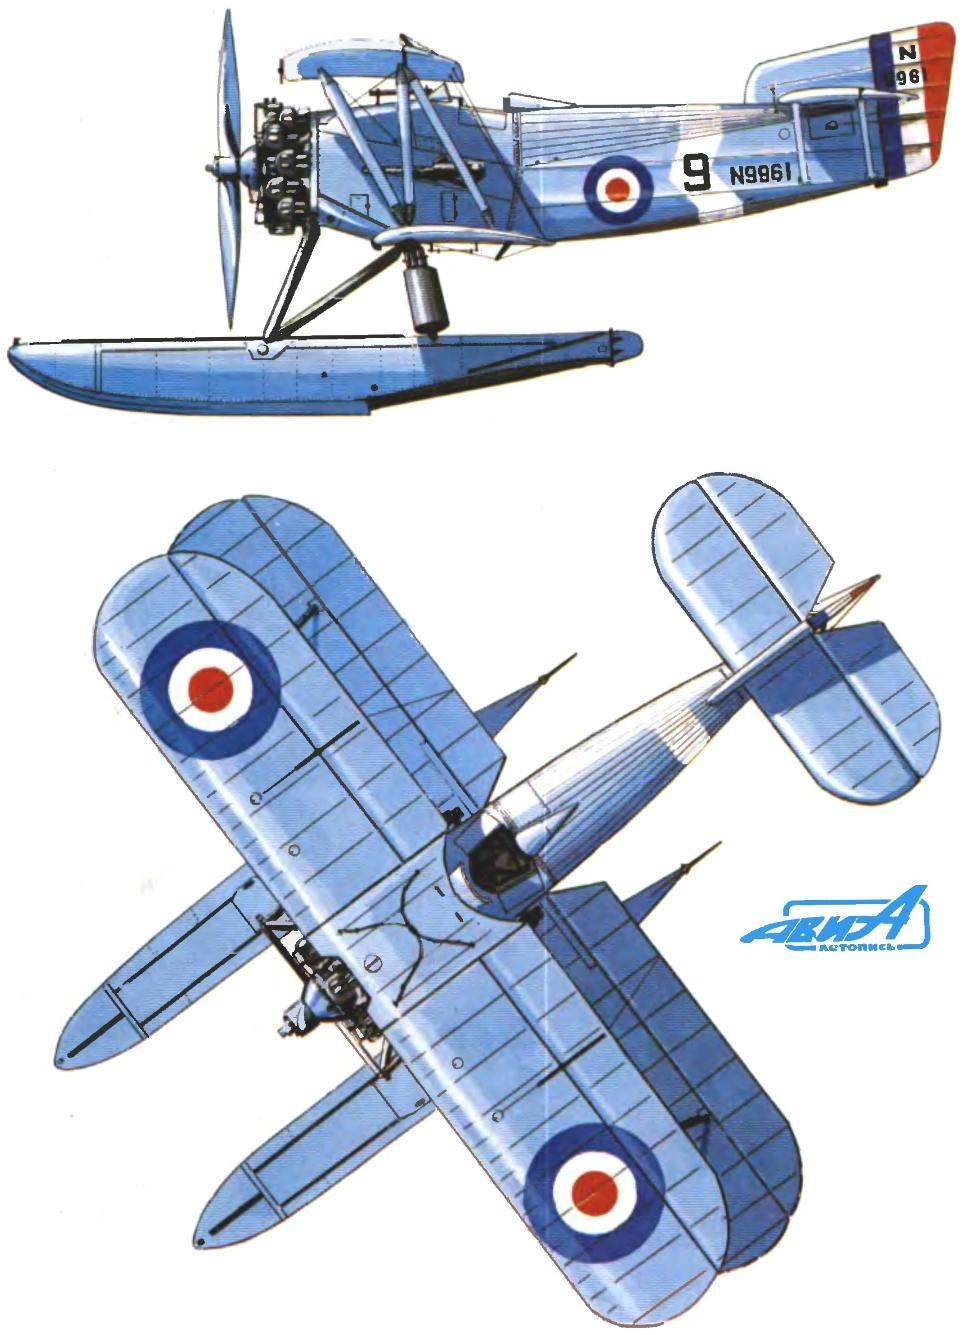 Fairey Flycatcher, 1928 год (авианосец «Гермес»).